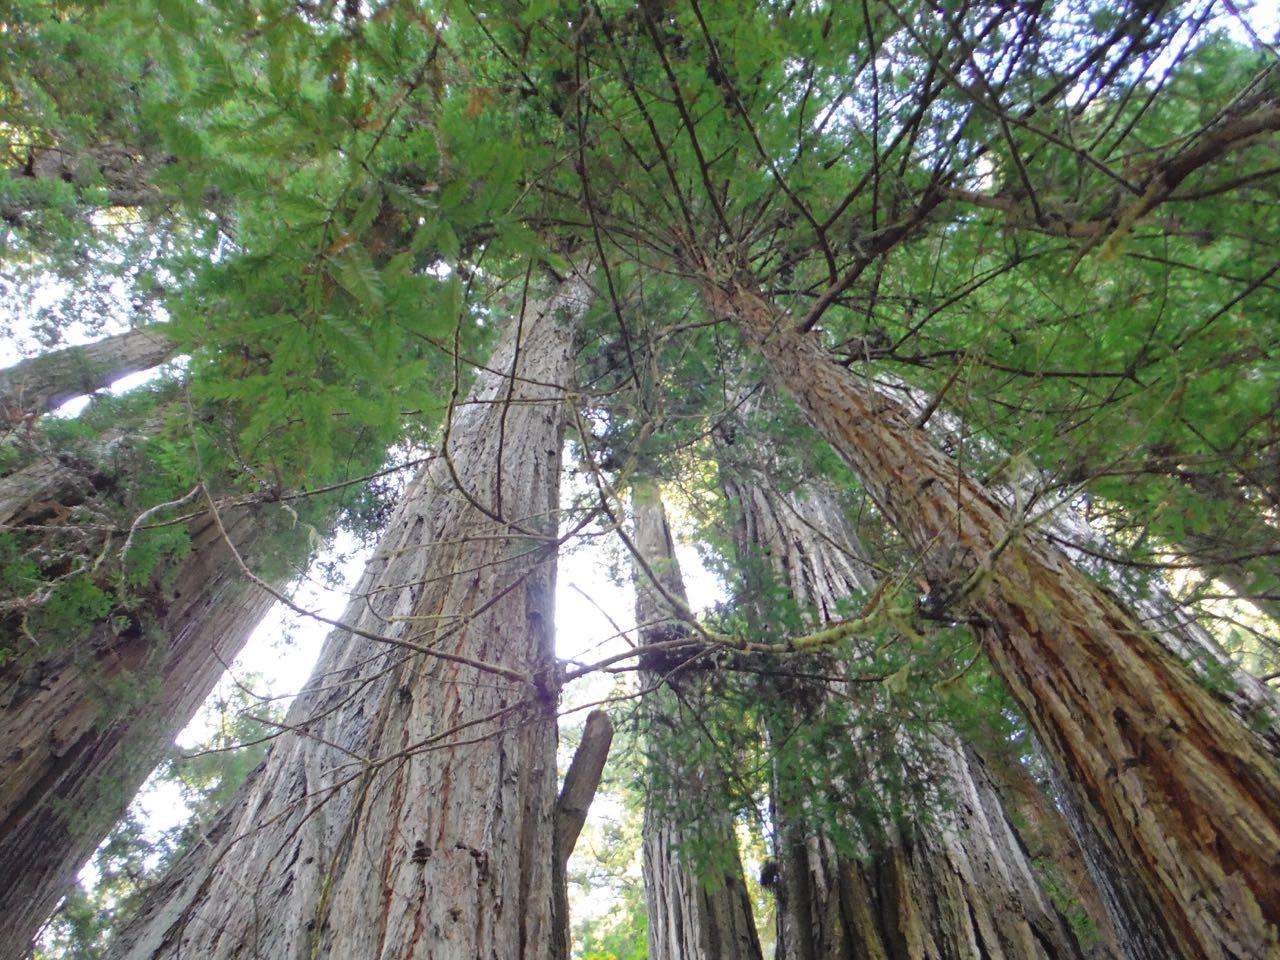 Redwoods 2017 10 08 278 Of 287